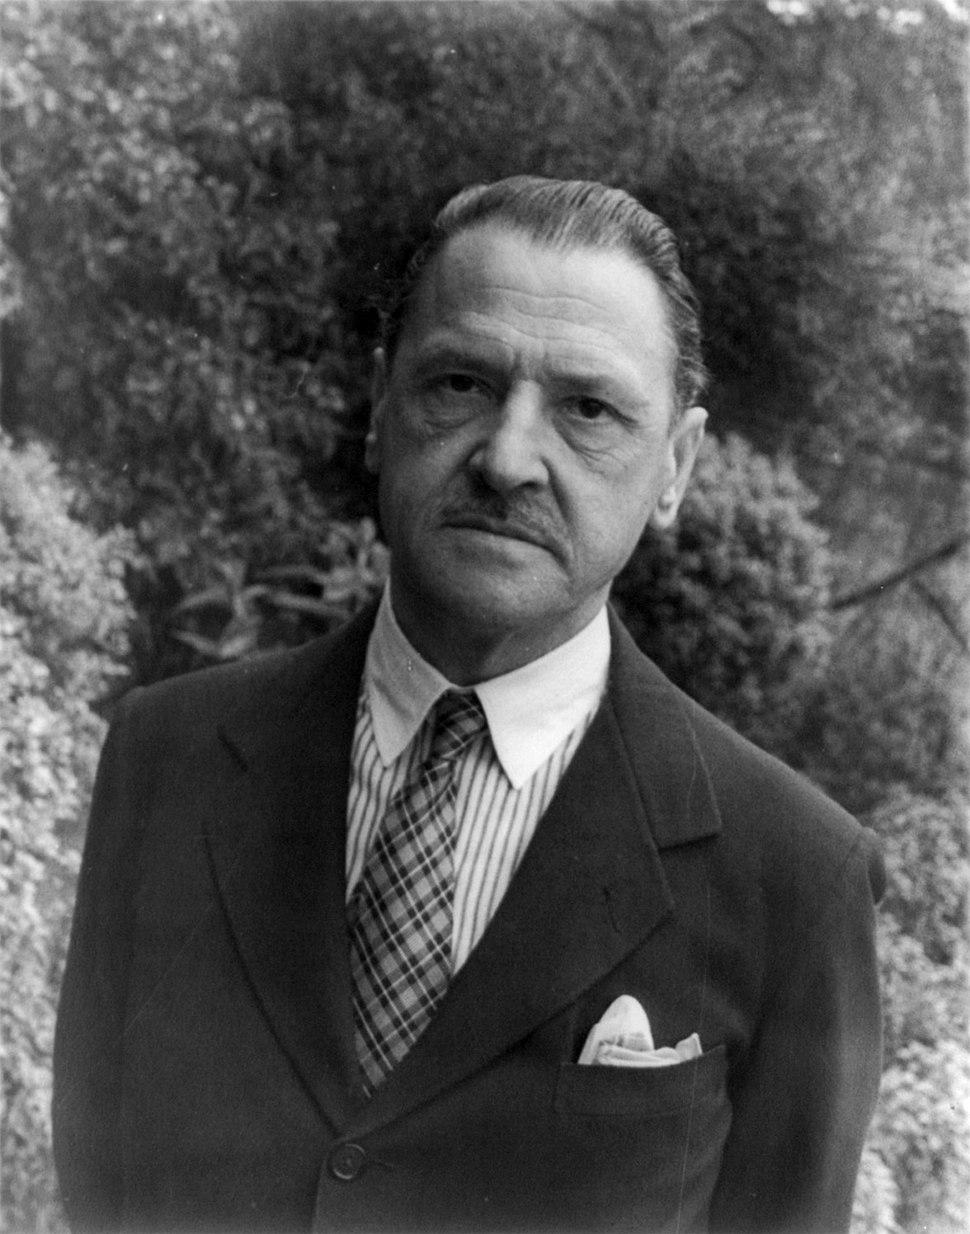 Somerset Maugham (1934)